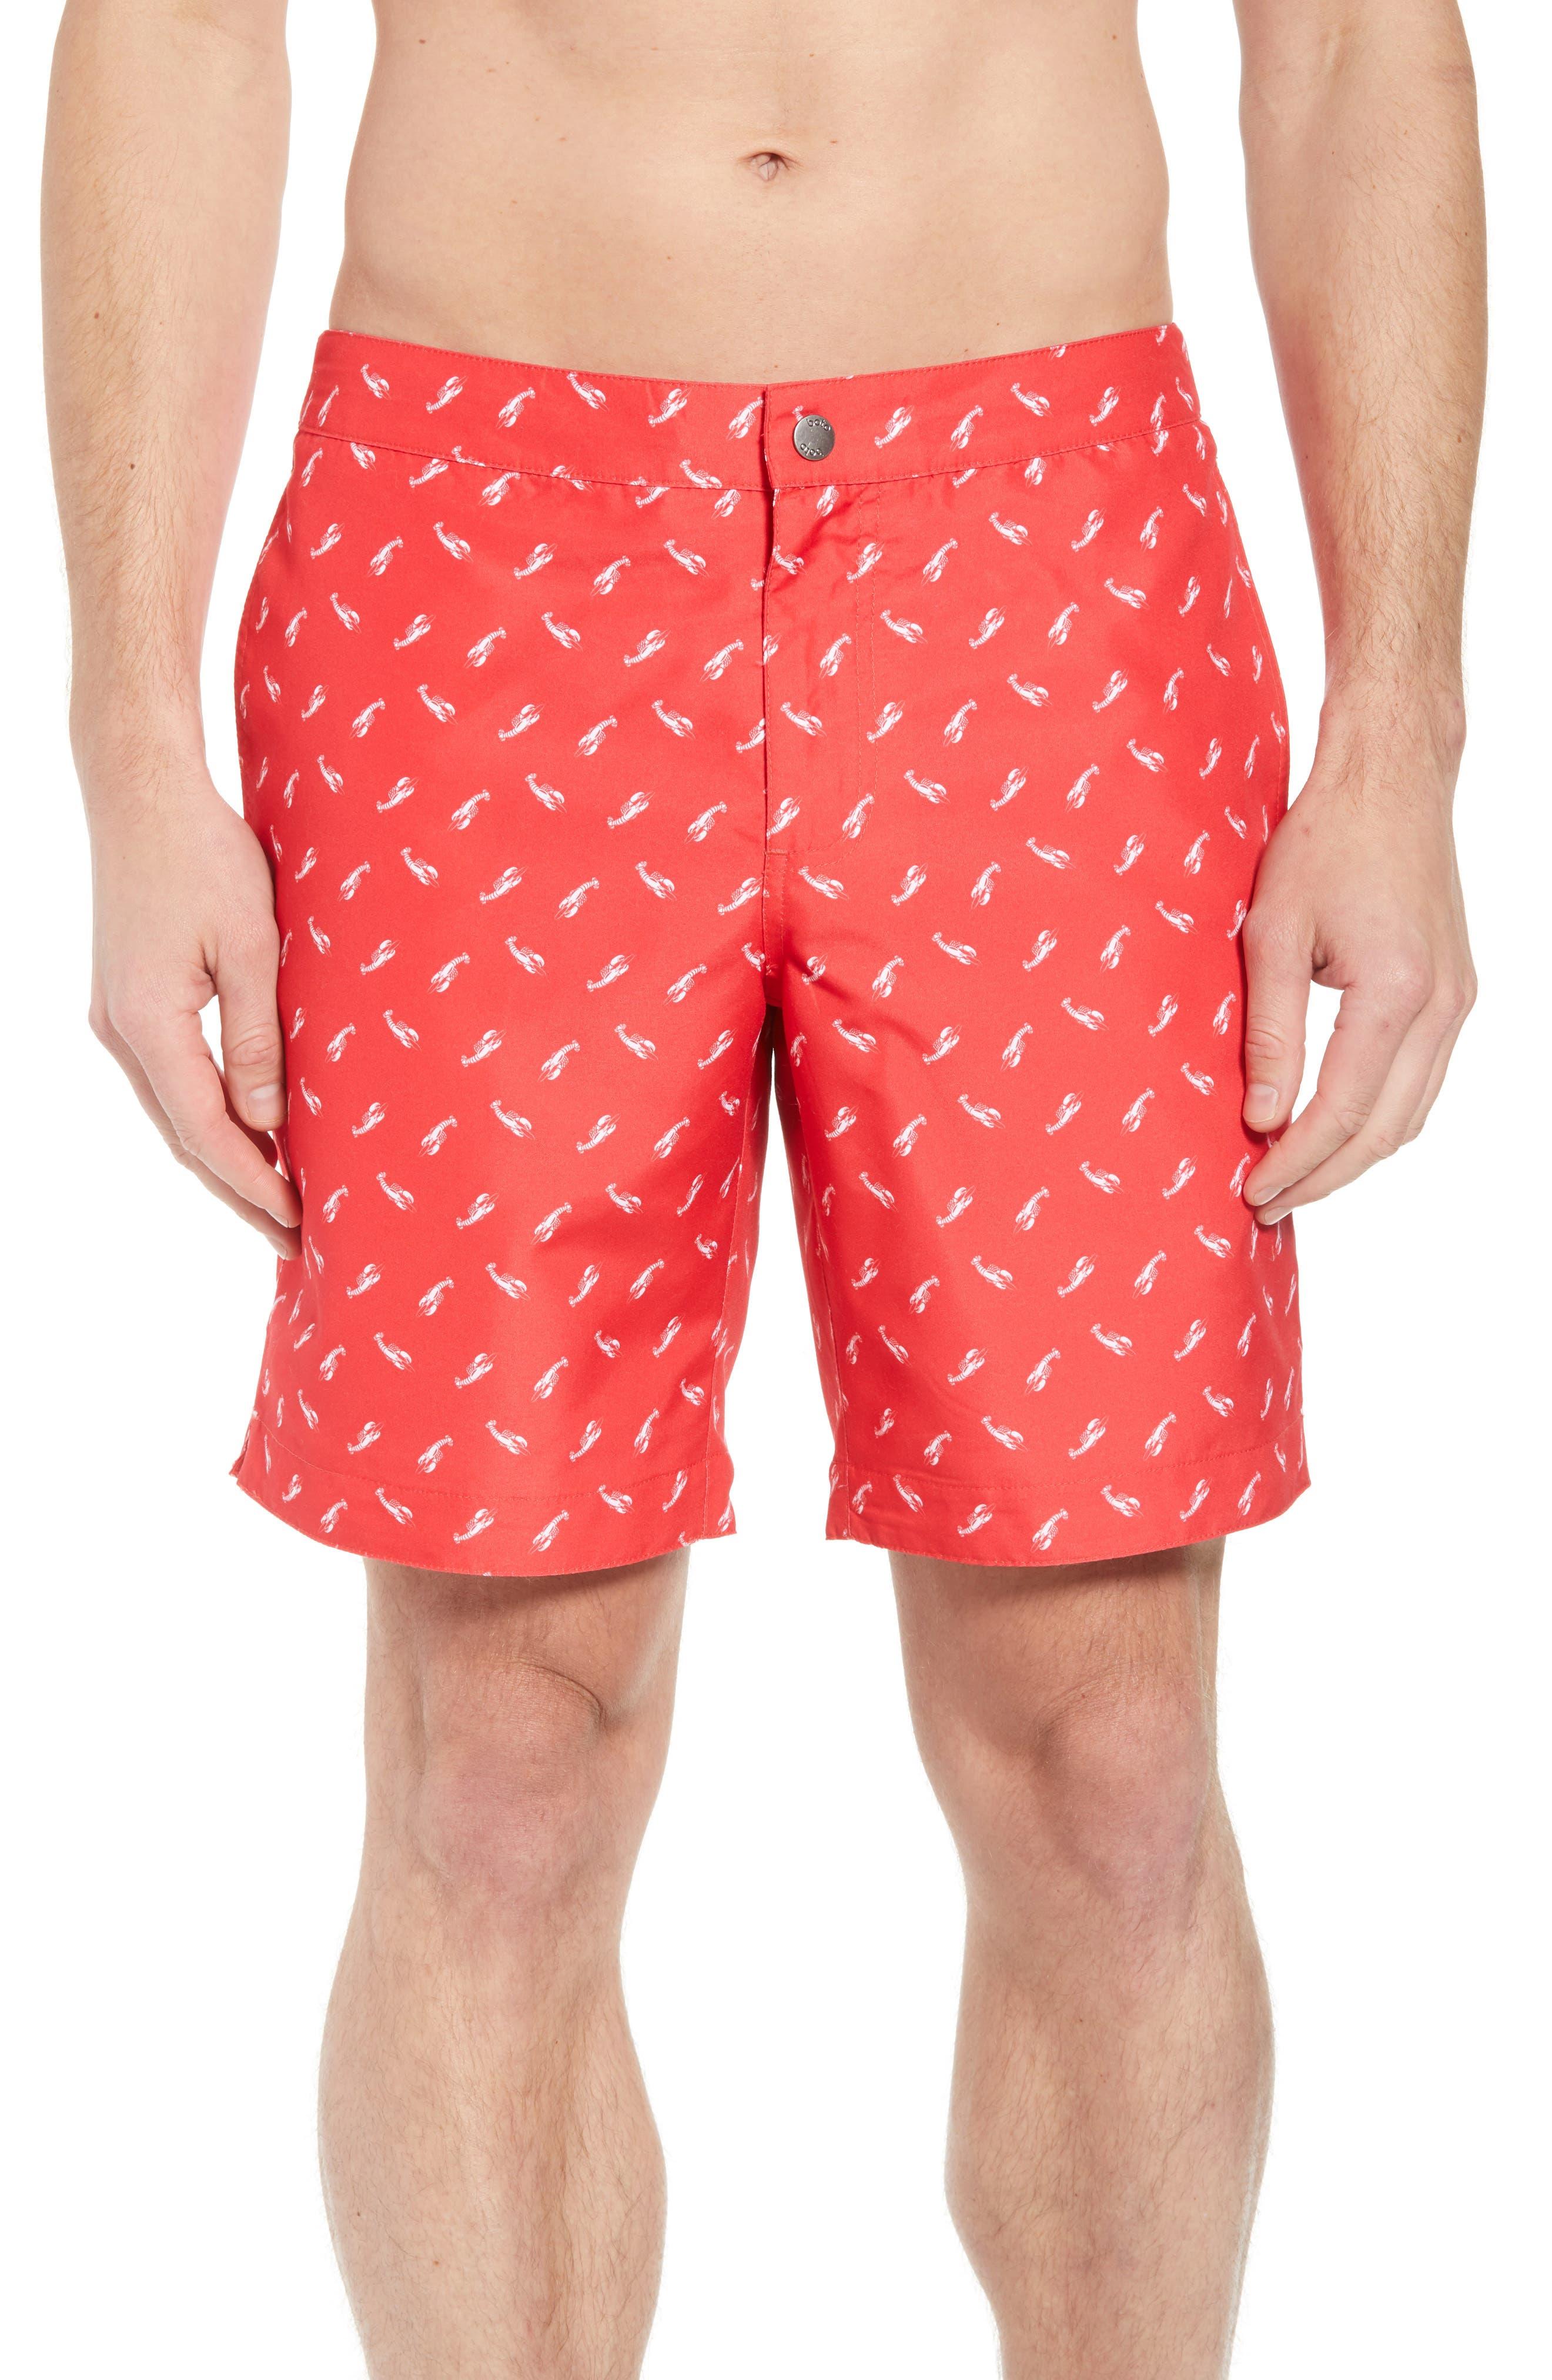 Aruba Slim Fit Swim Trunks,                         Main,                         color, Red Lobsters Print